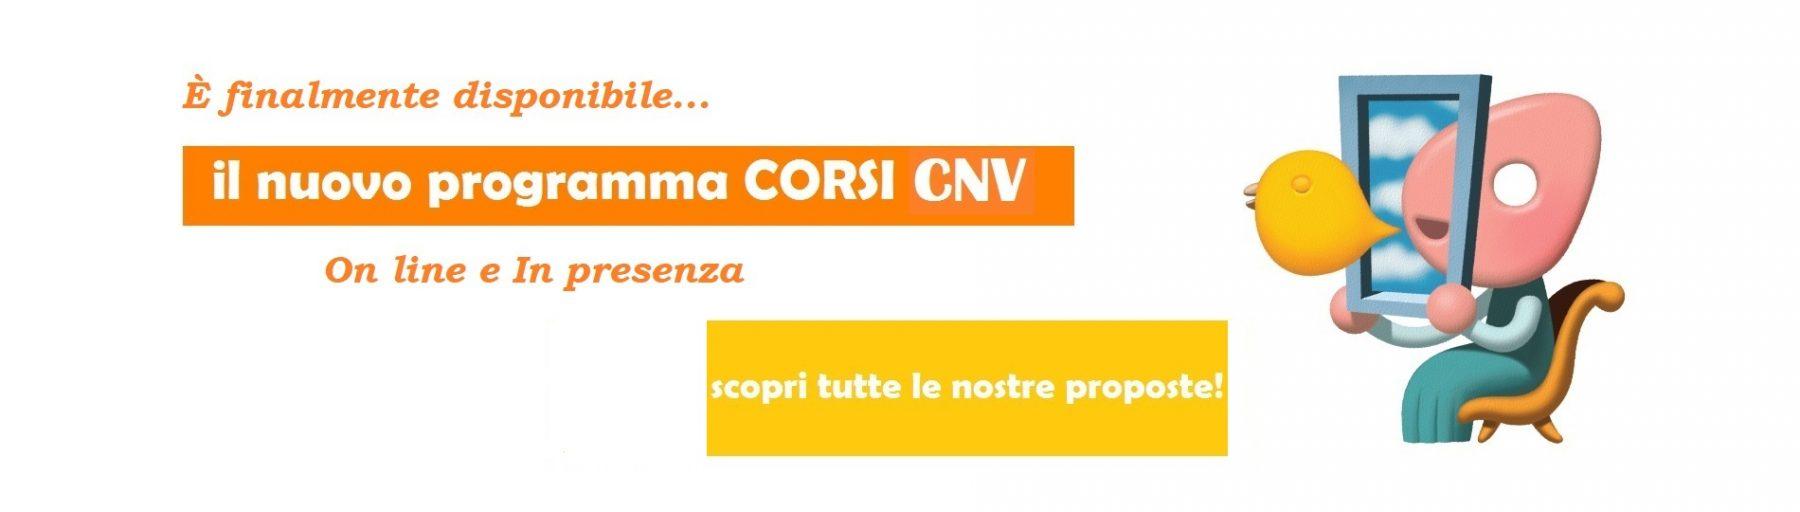 Slide-Nuovi-Corsi-e1623146486969